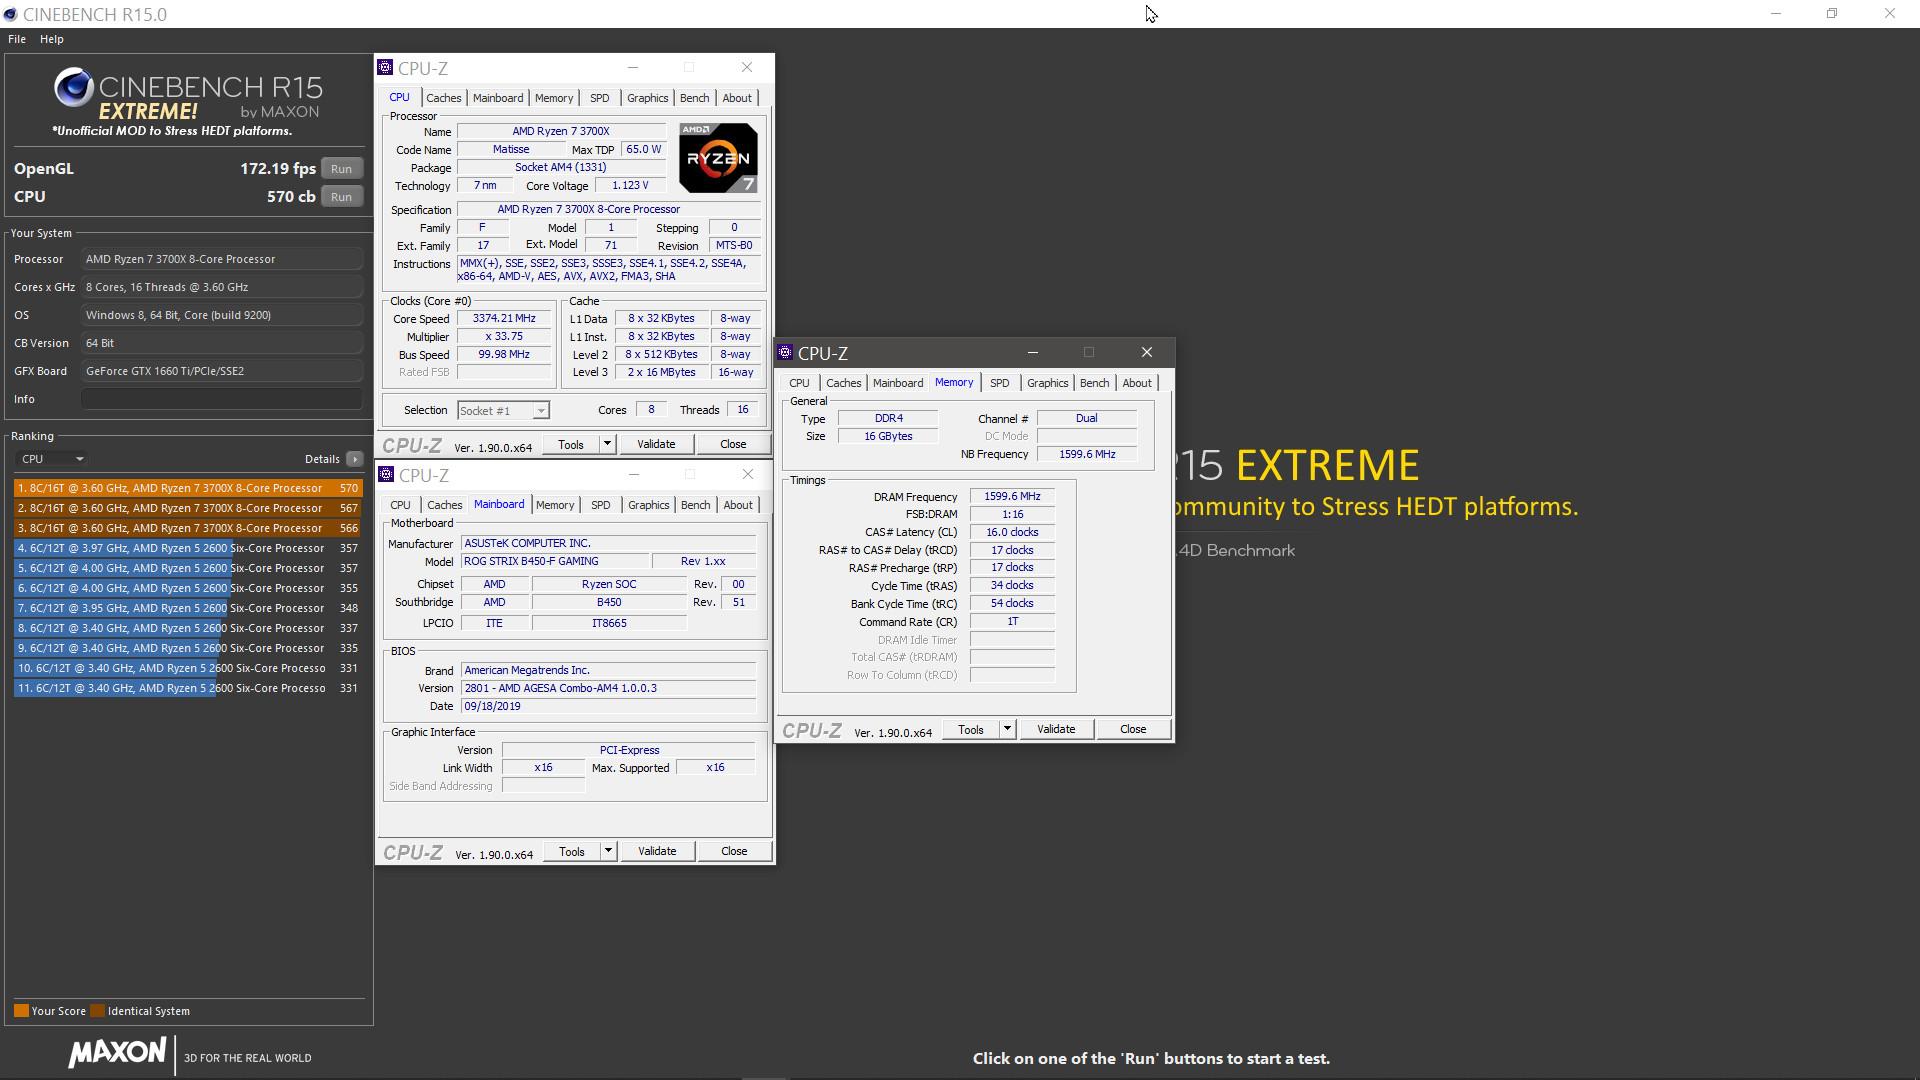 CinebenchR15-Extreme-3700x-PBO-PE3-3200-RAM-570-.jpg